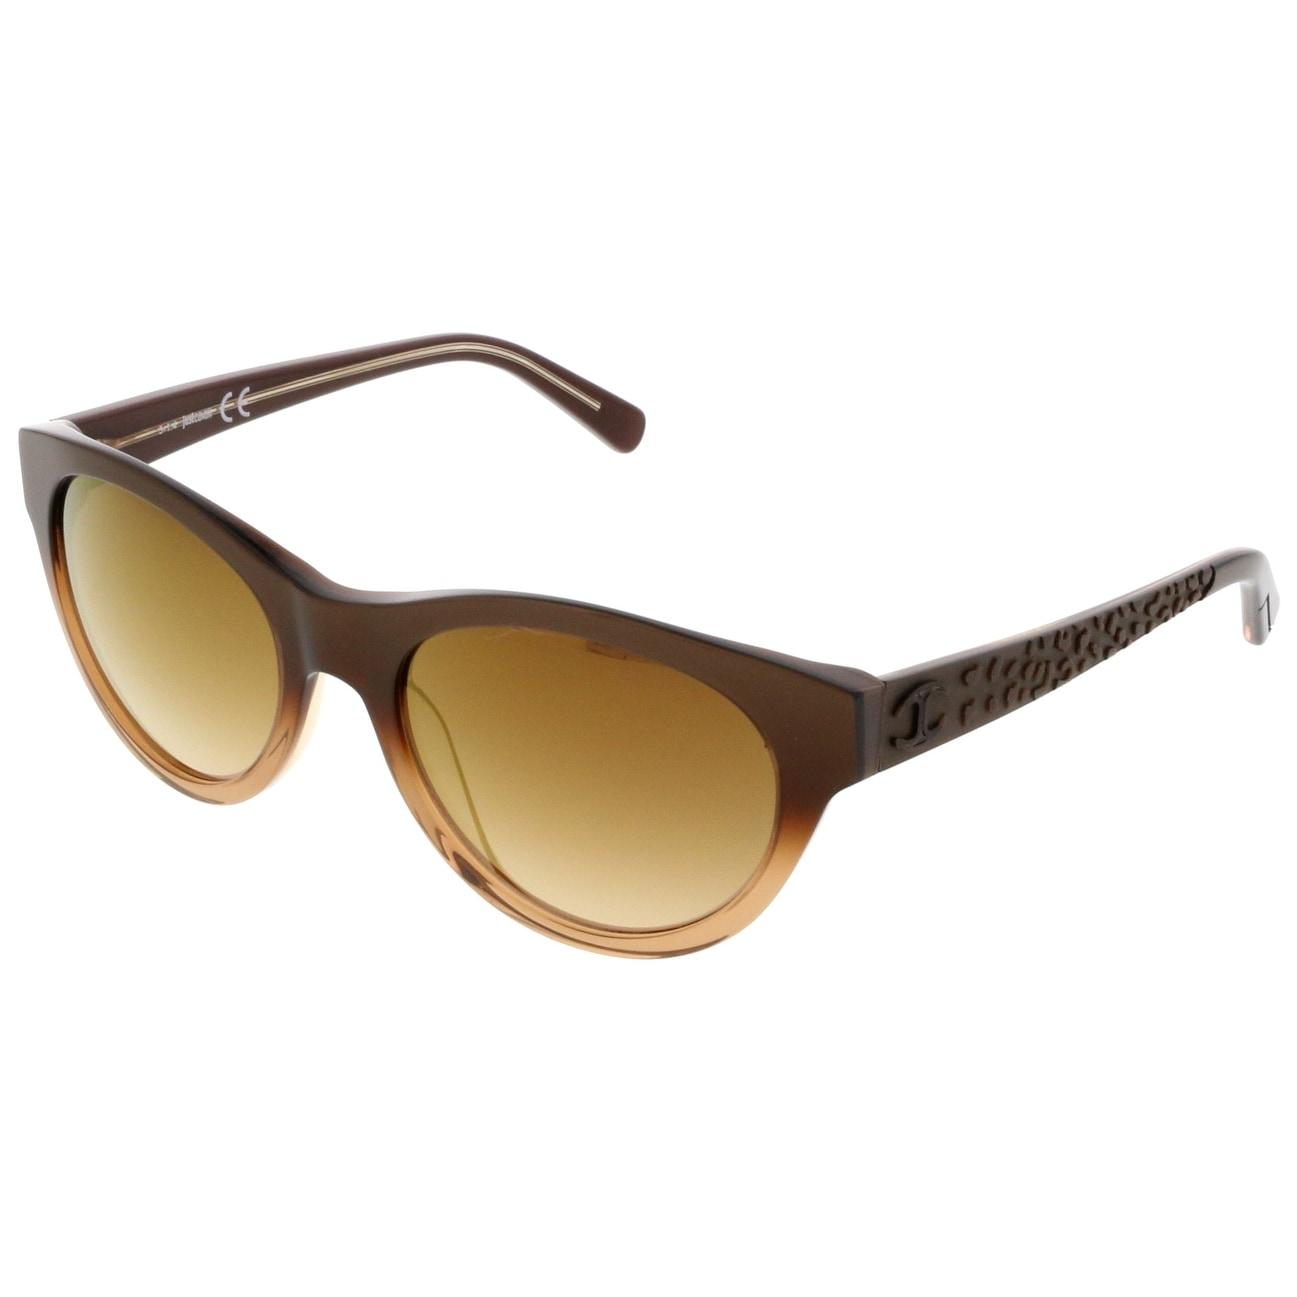 67f4565021 Just Cavalli Sunglasses